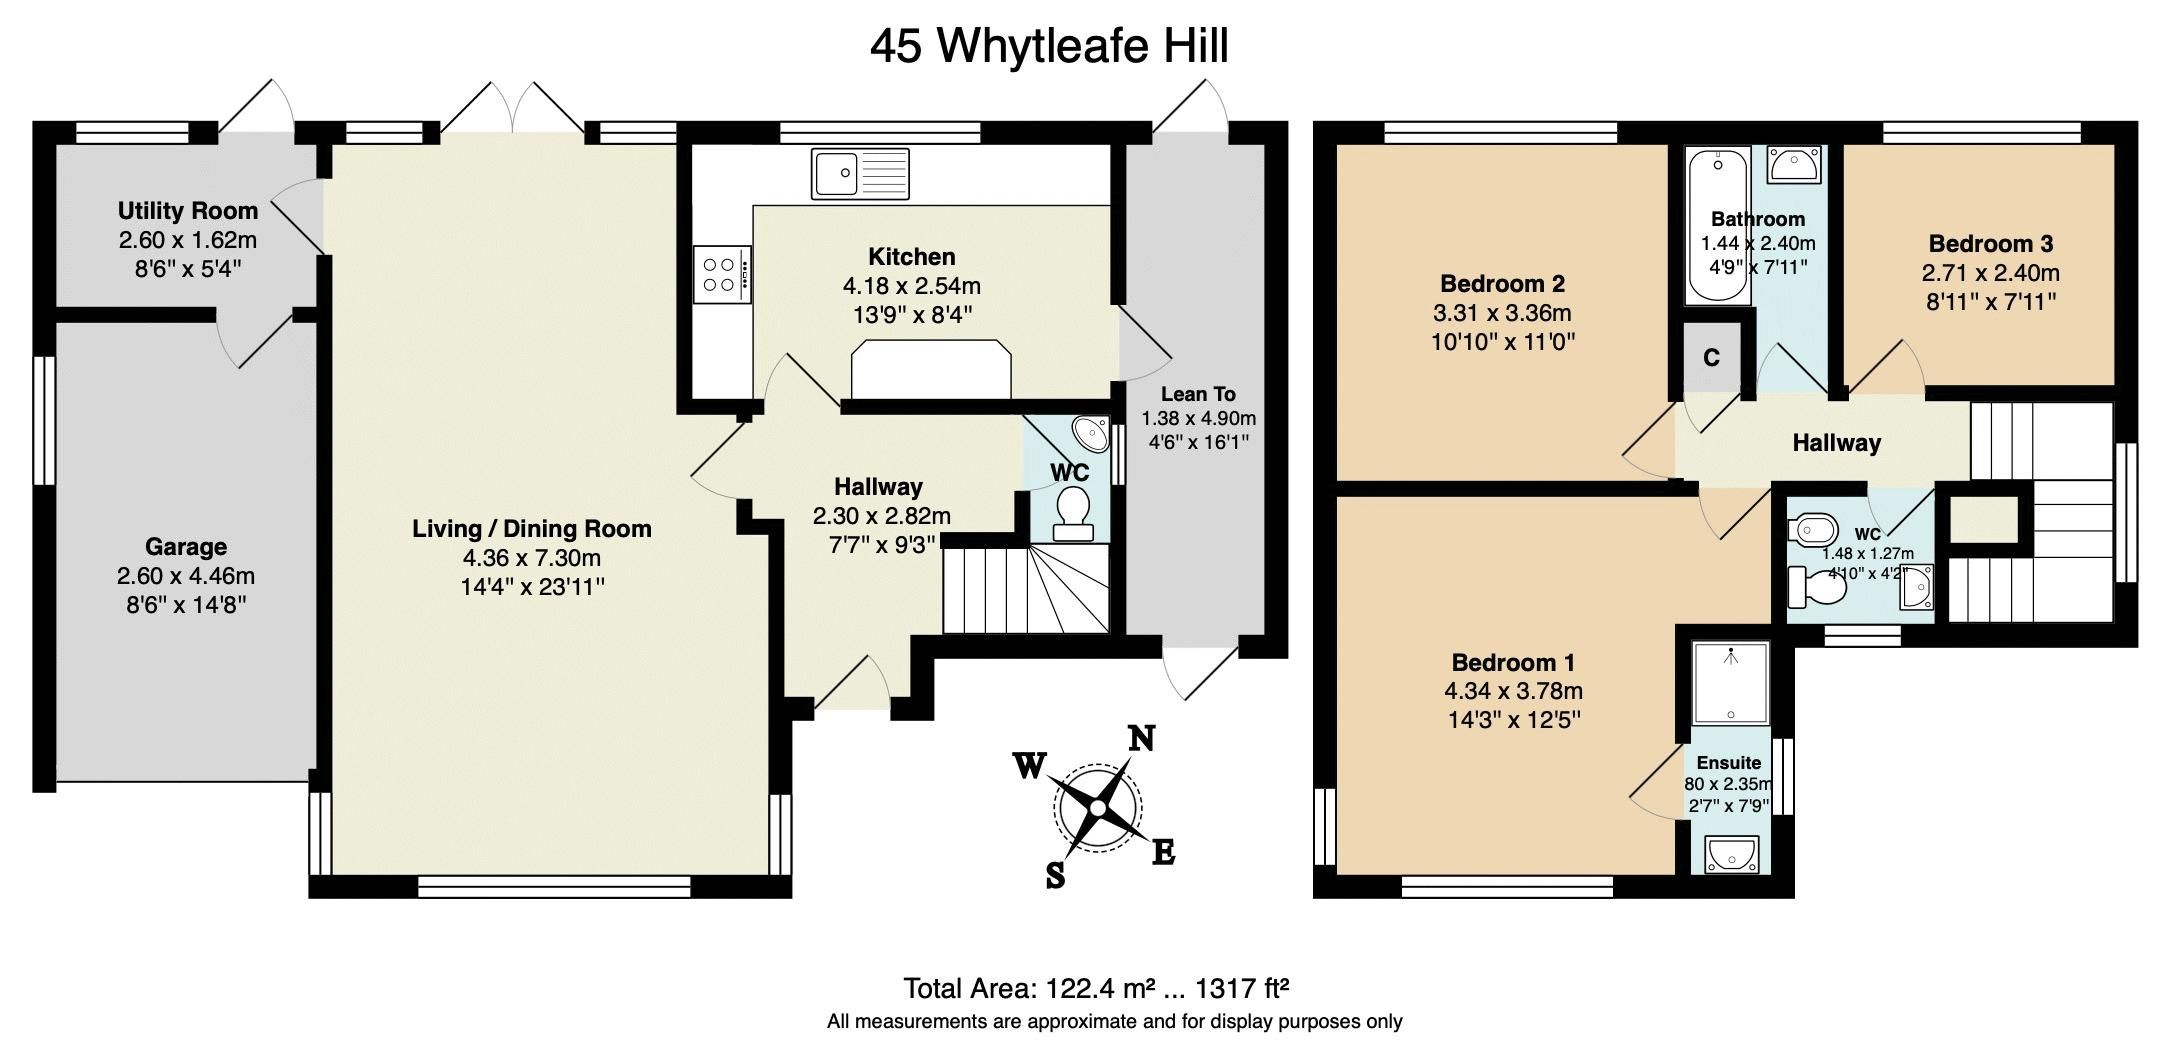 Whyteleafe Hill